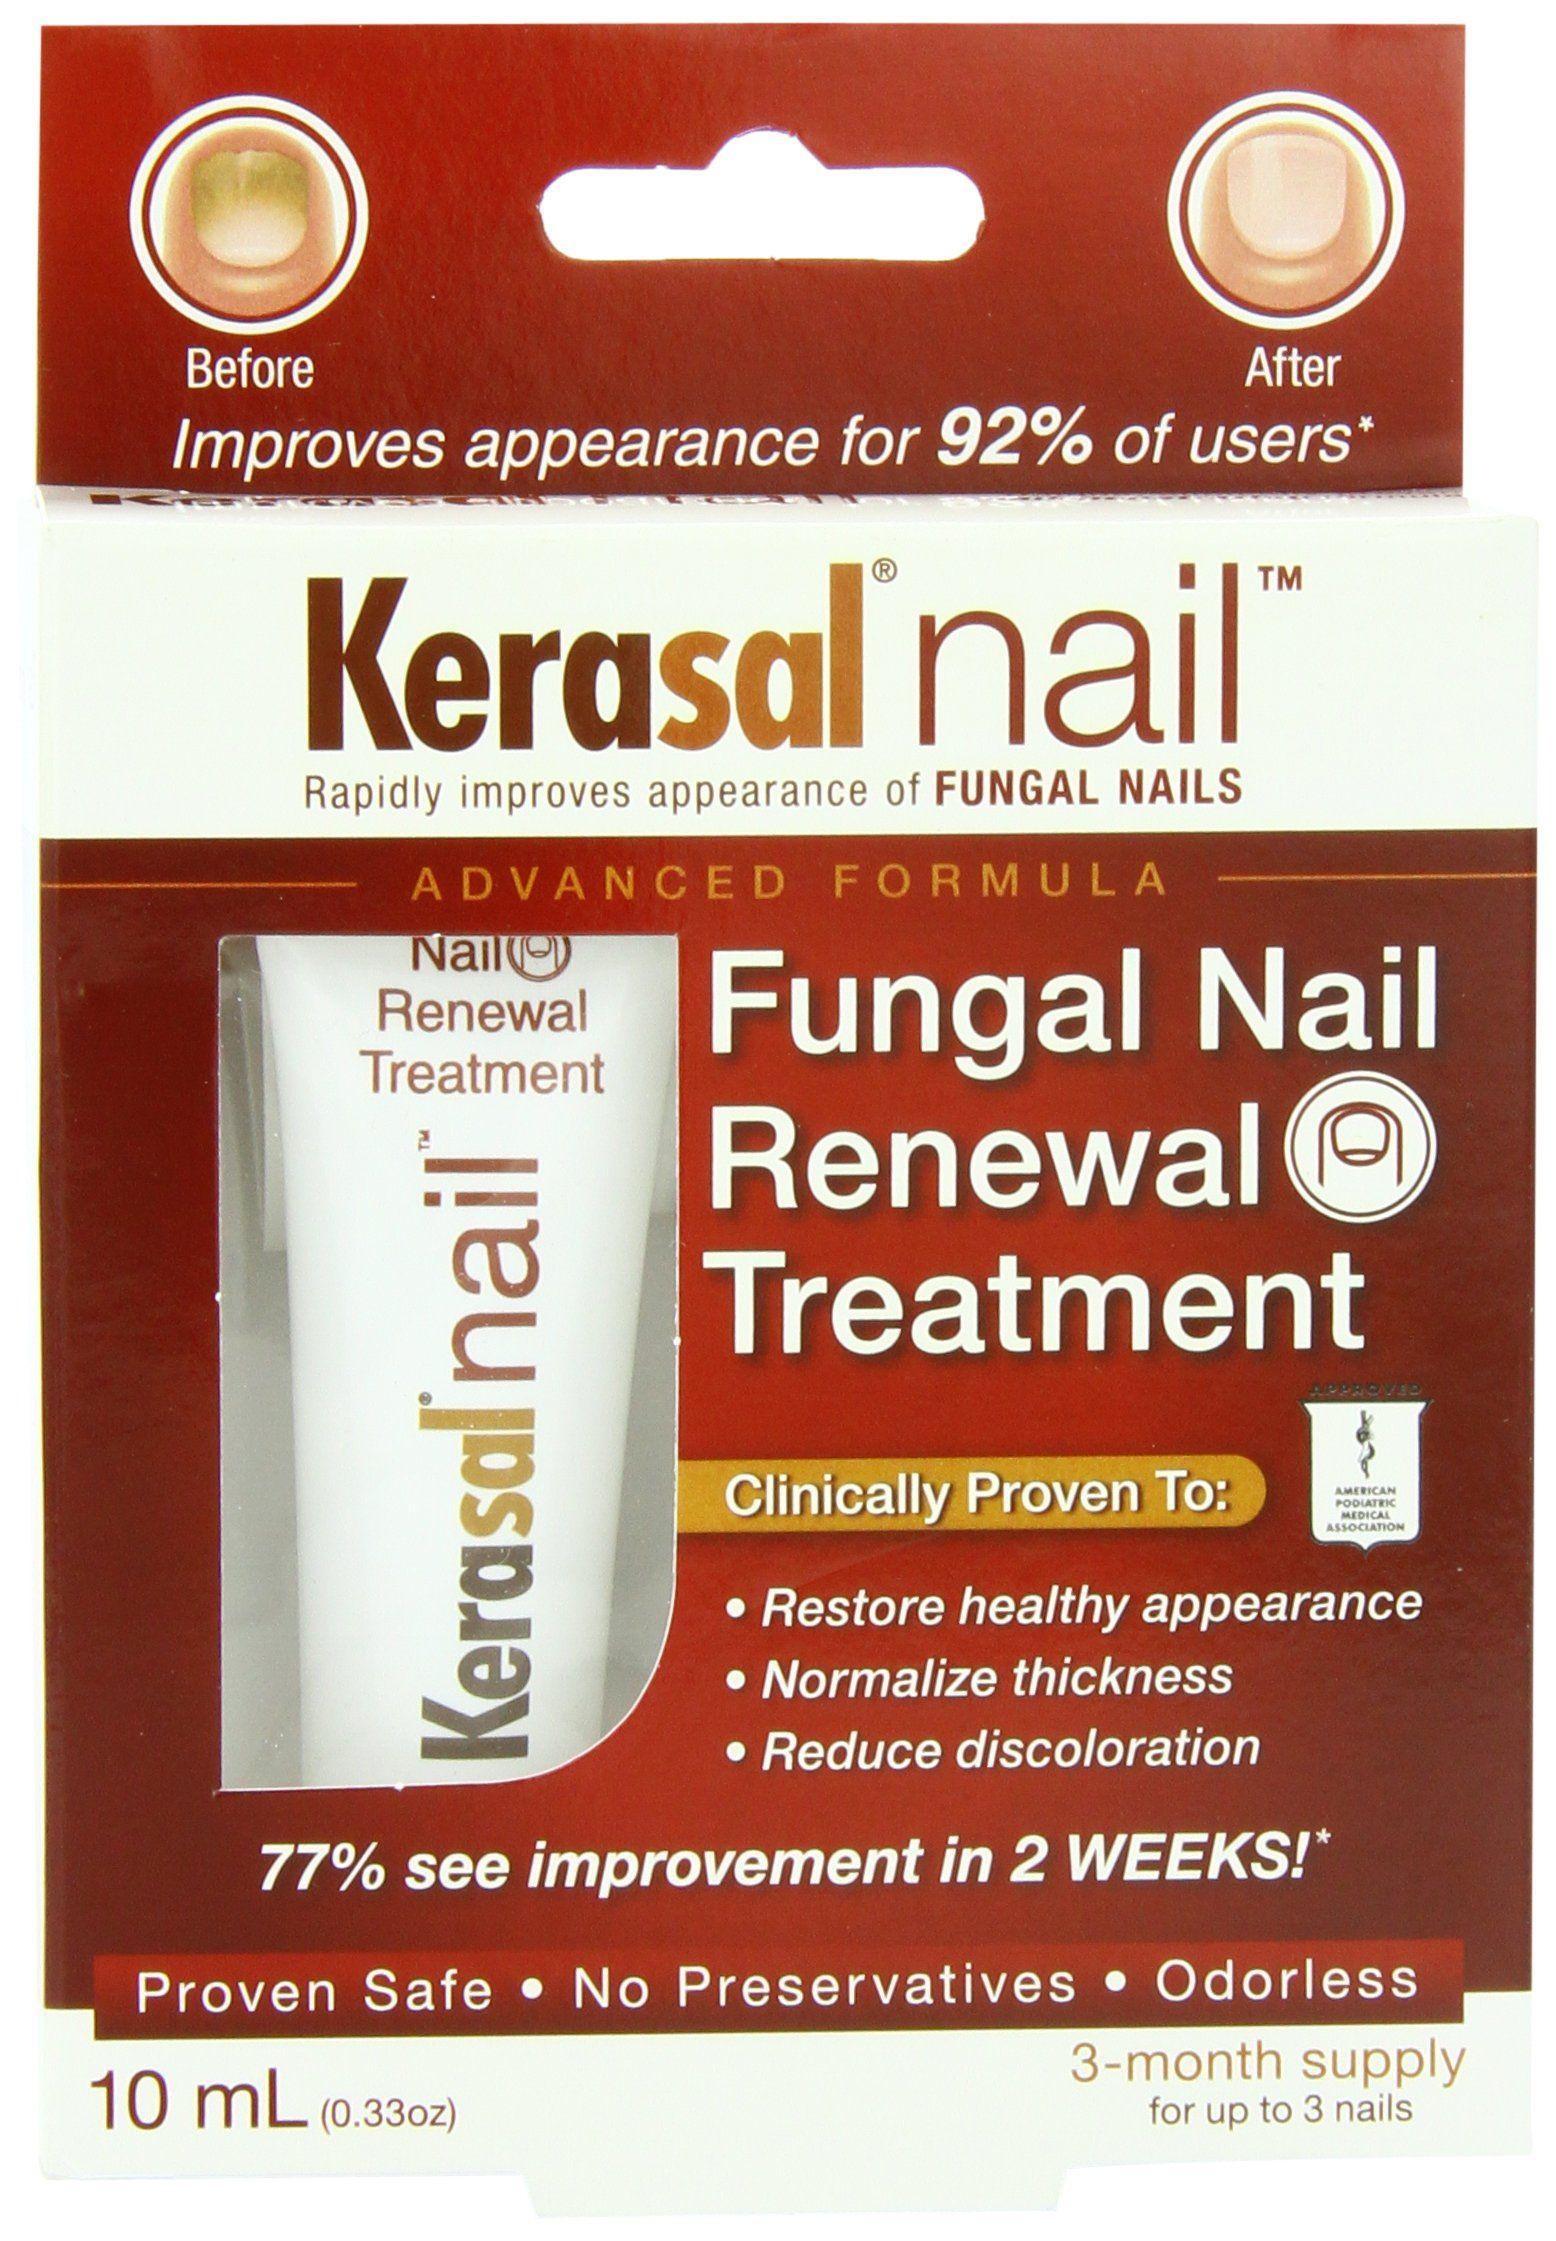 Kerasal Nail Fungal Nail Renewal Treatment, 10ml | Podiatry | Pinterest